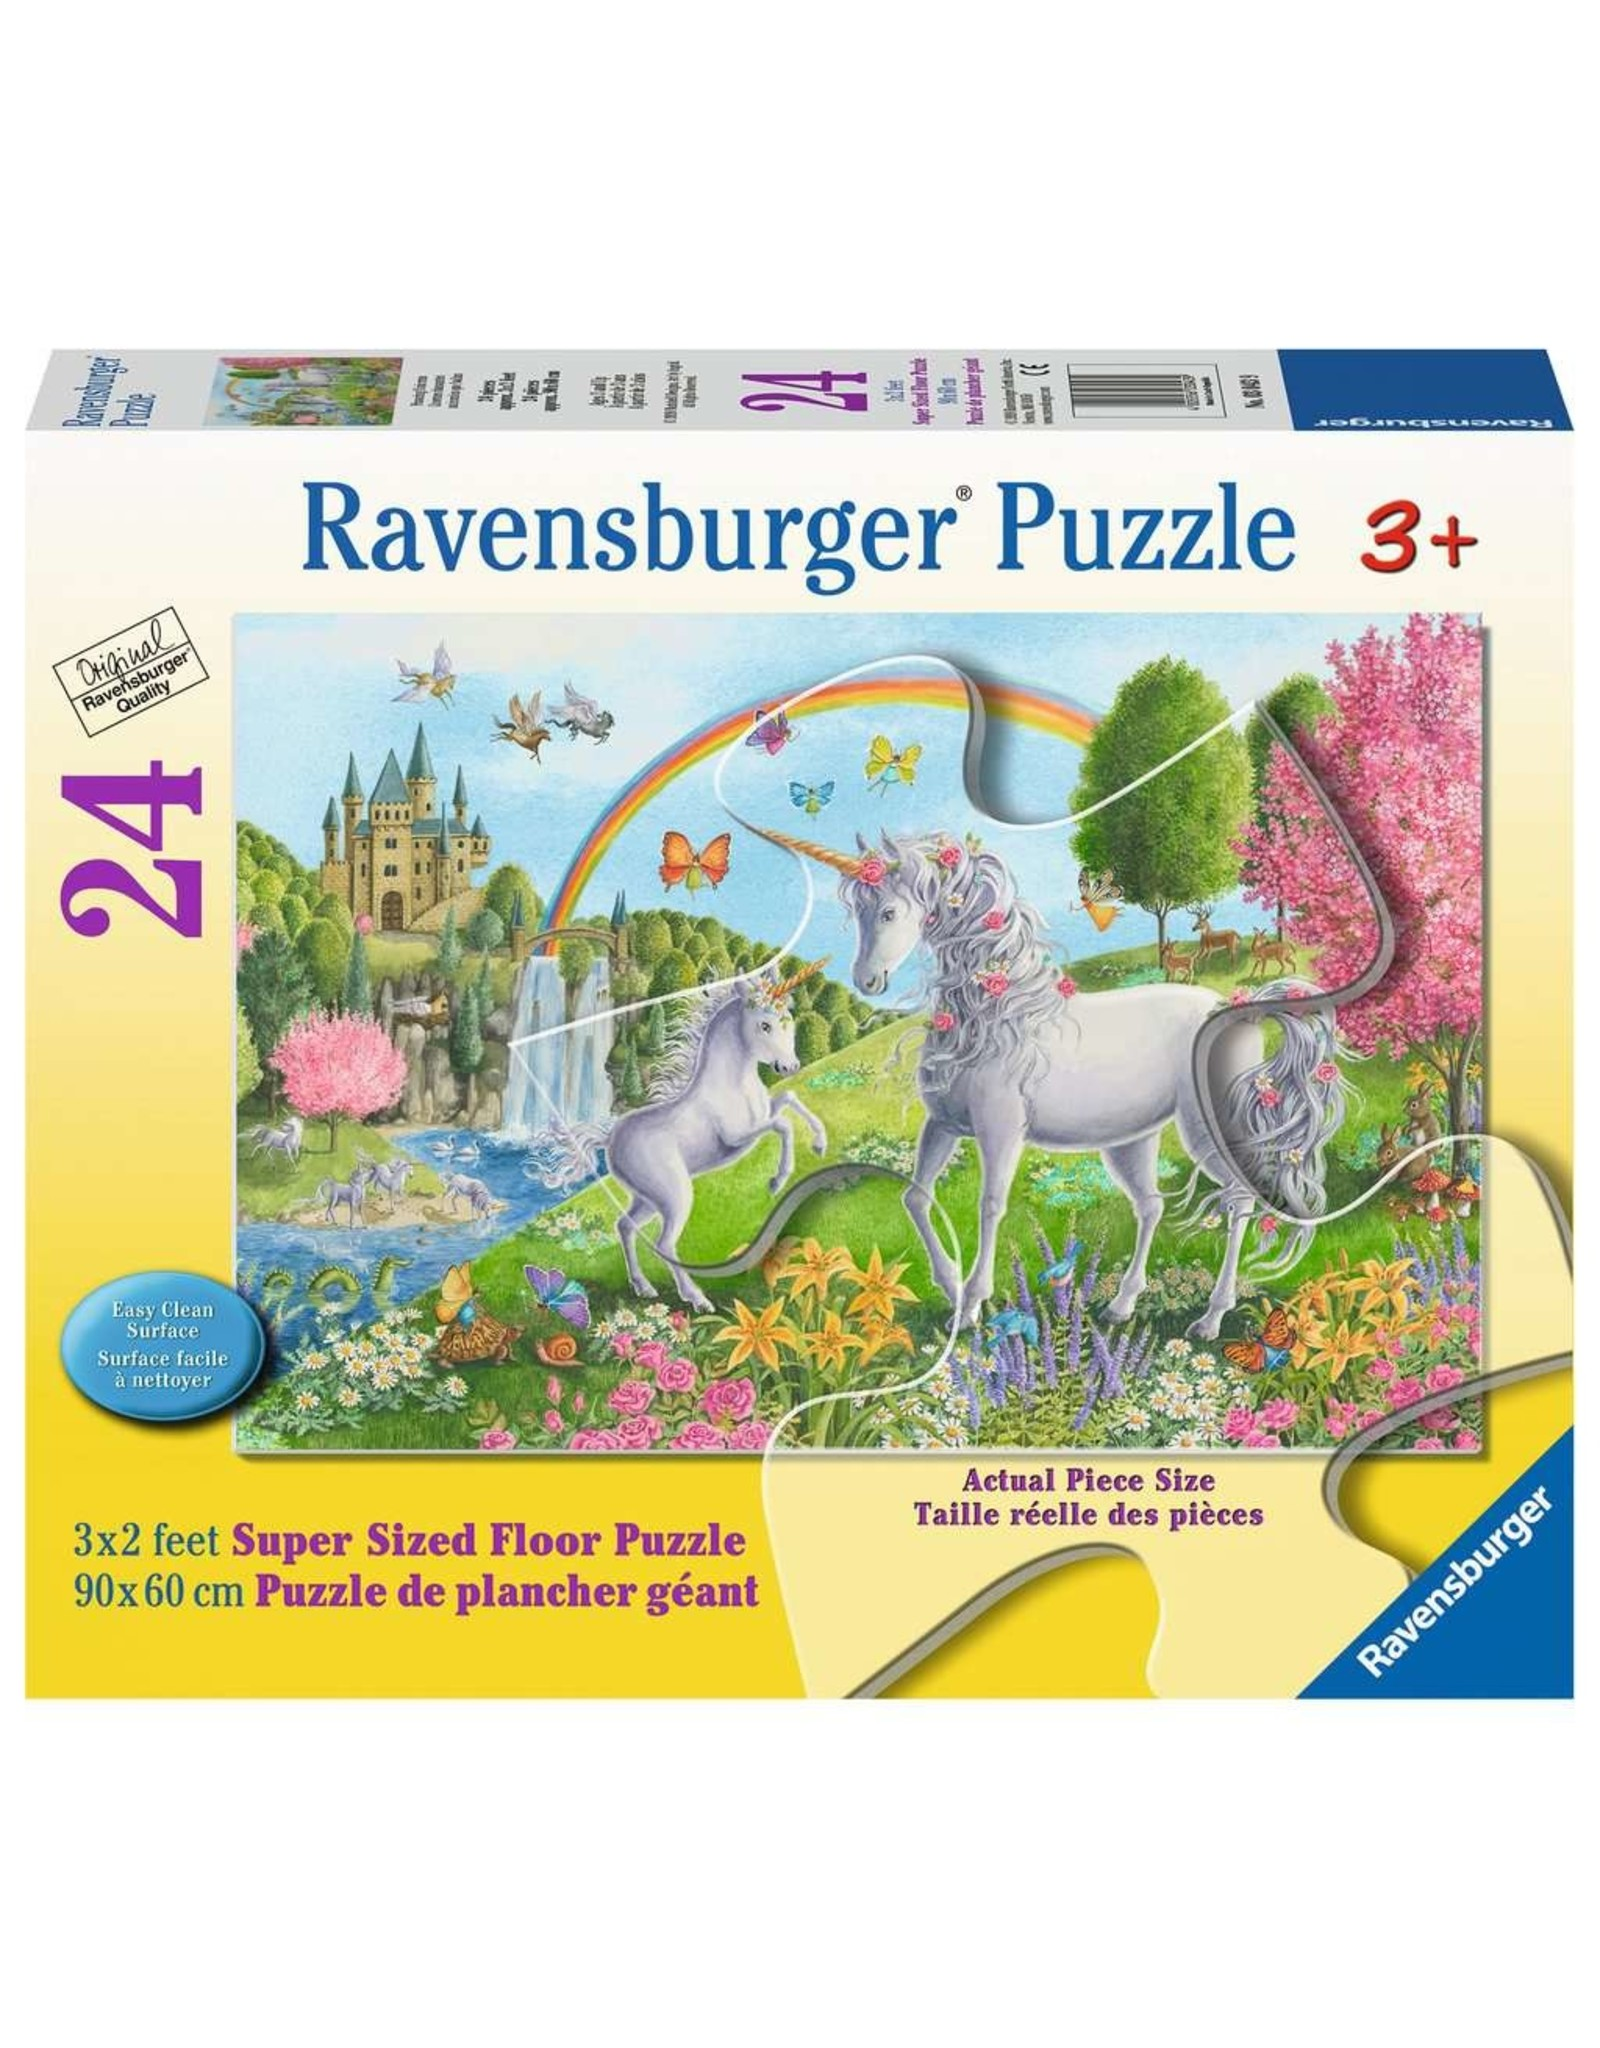 Ravensburger Prancing Unicorns - 24 Piece Floor Puzzle